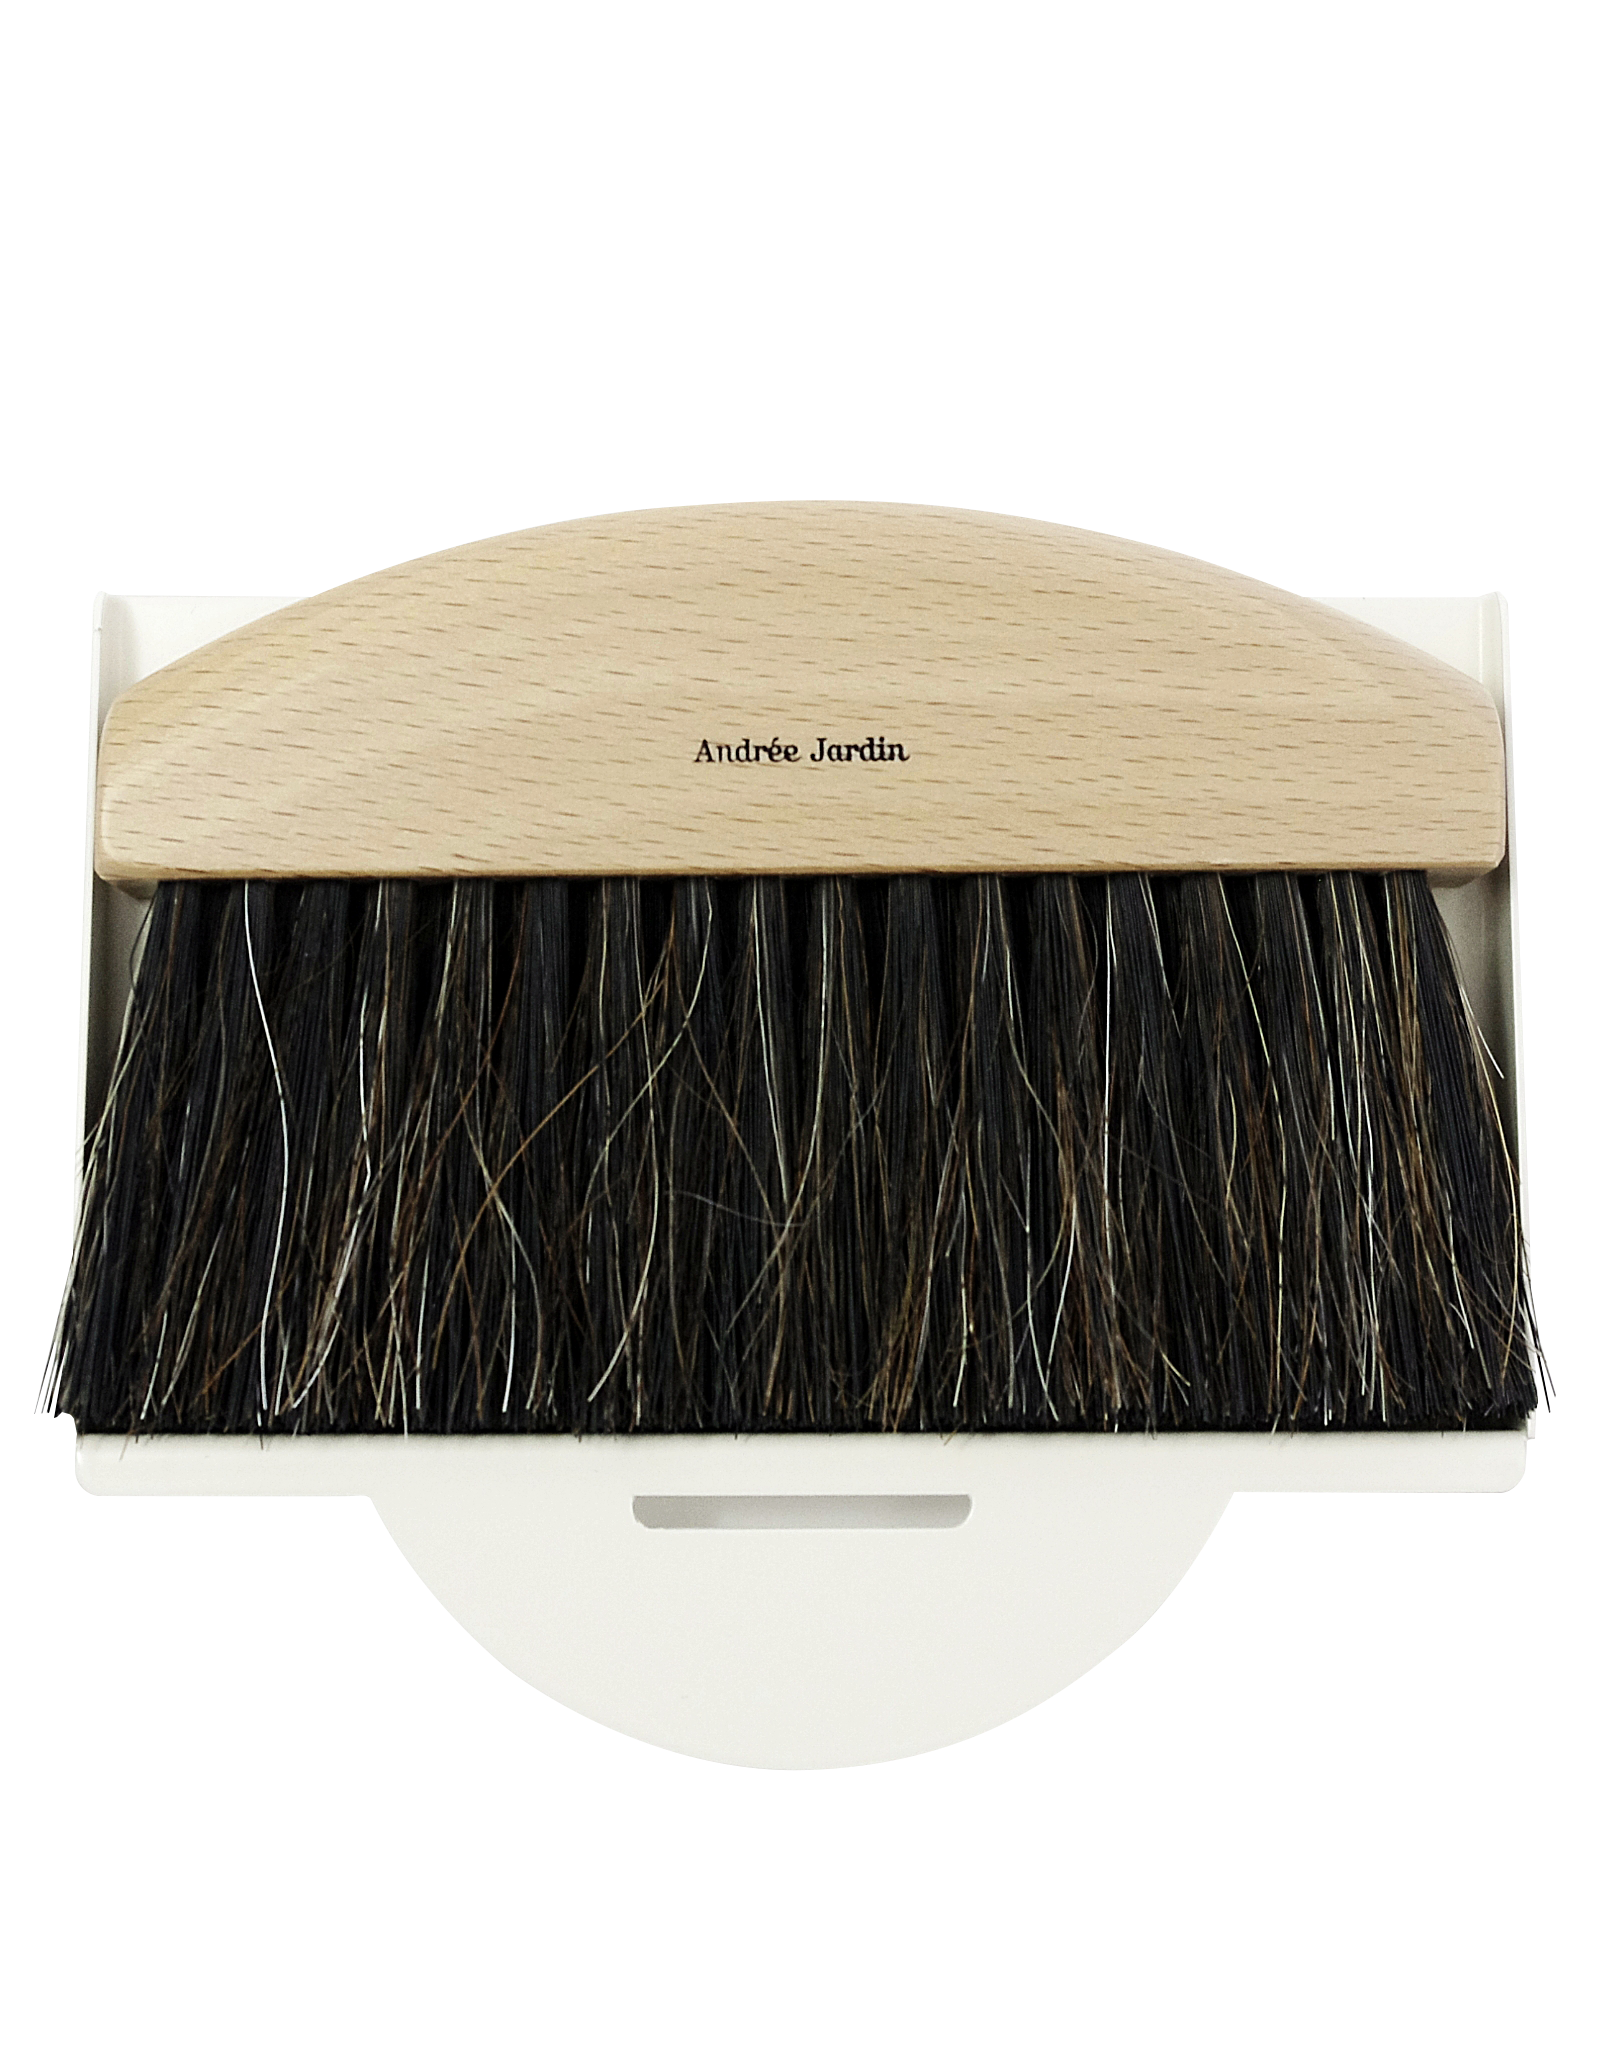 Andrée Jardin Table brush and dustpan